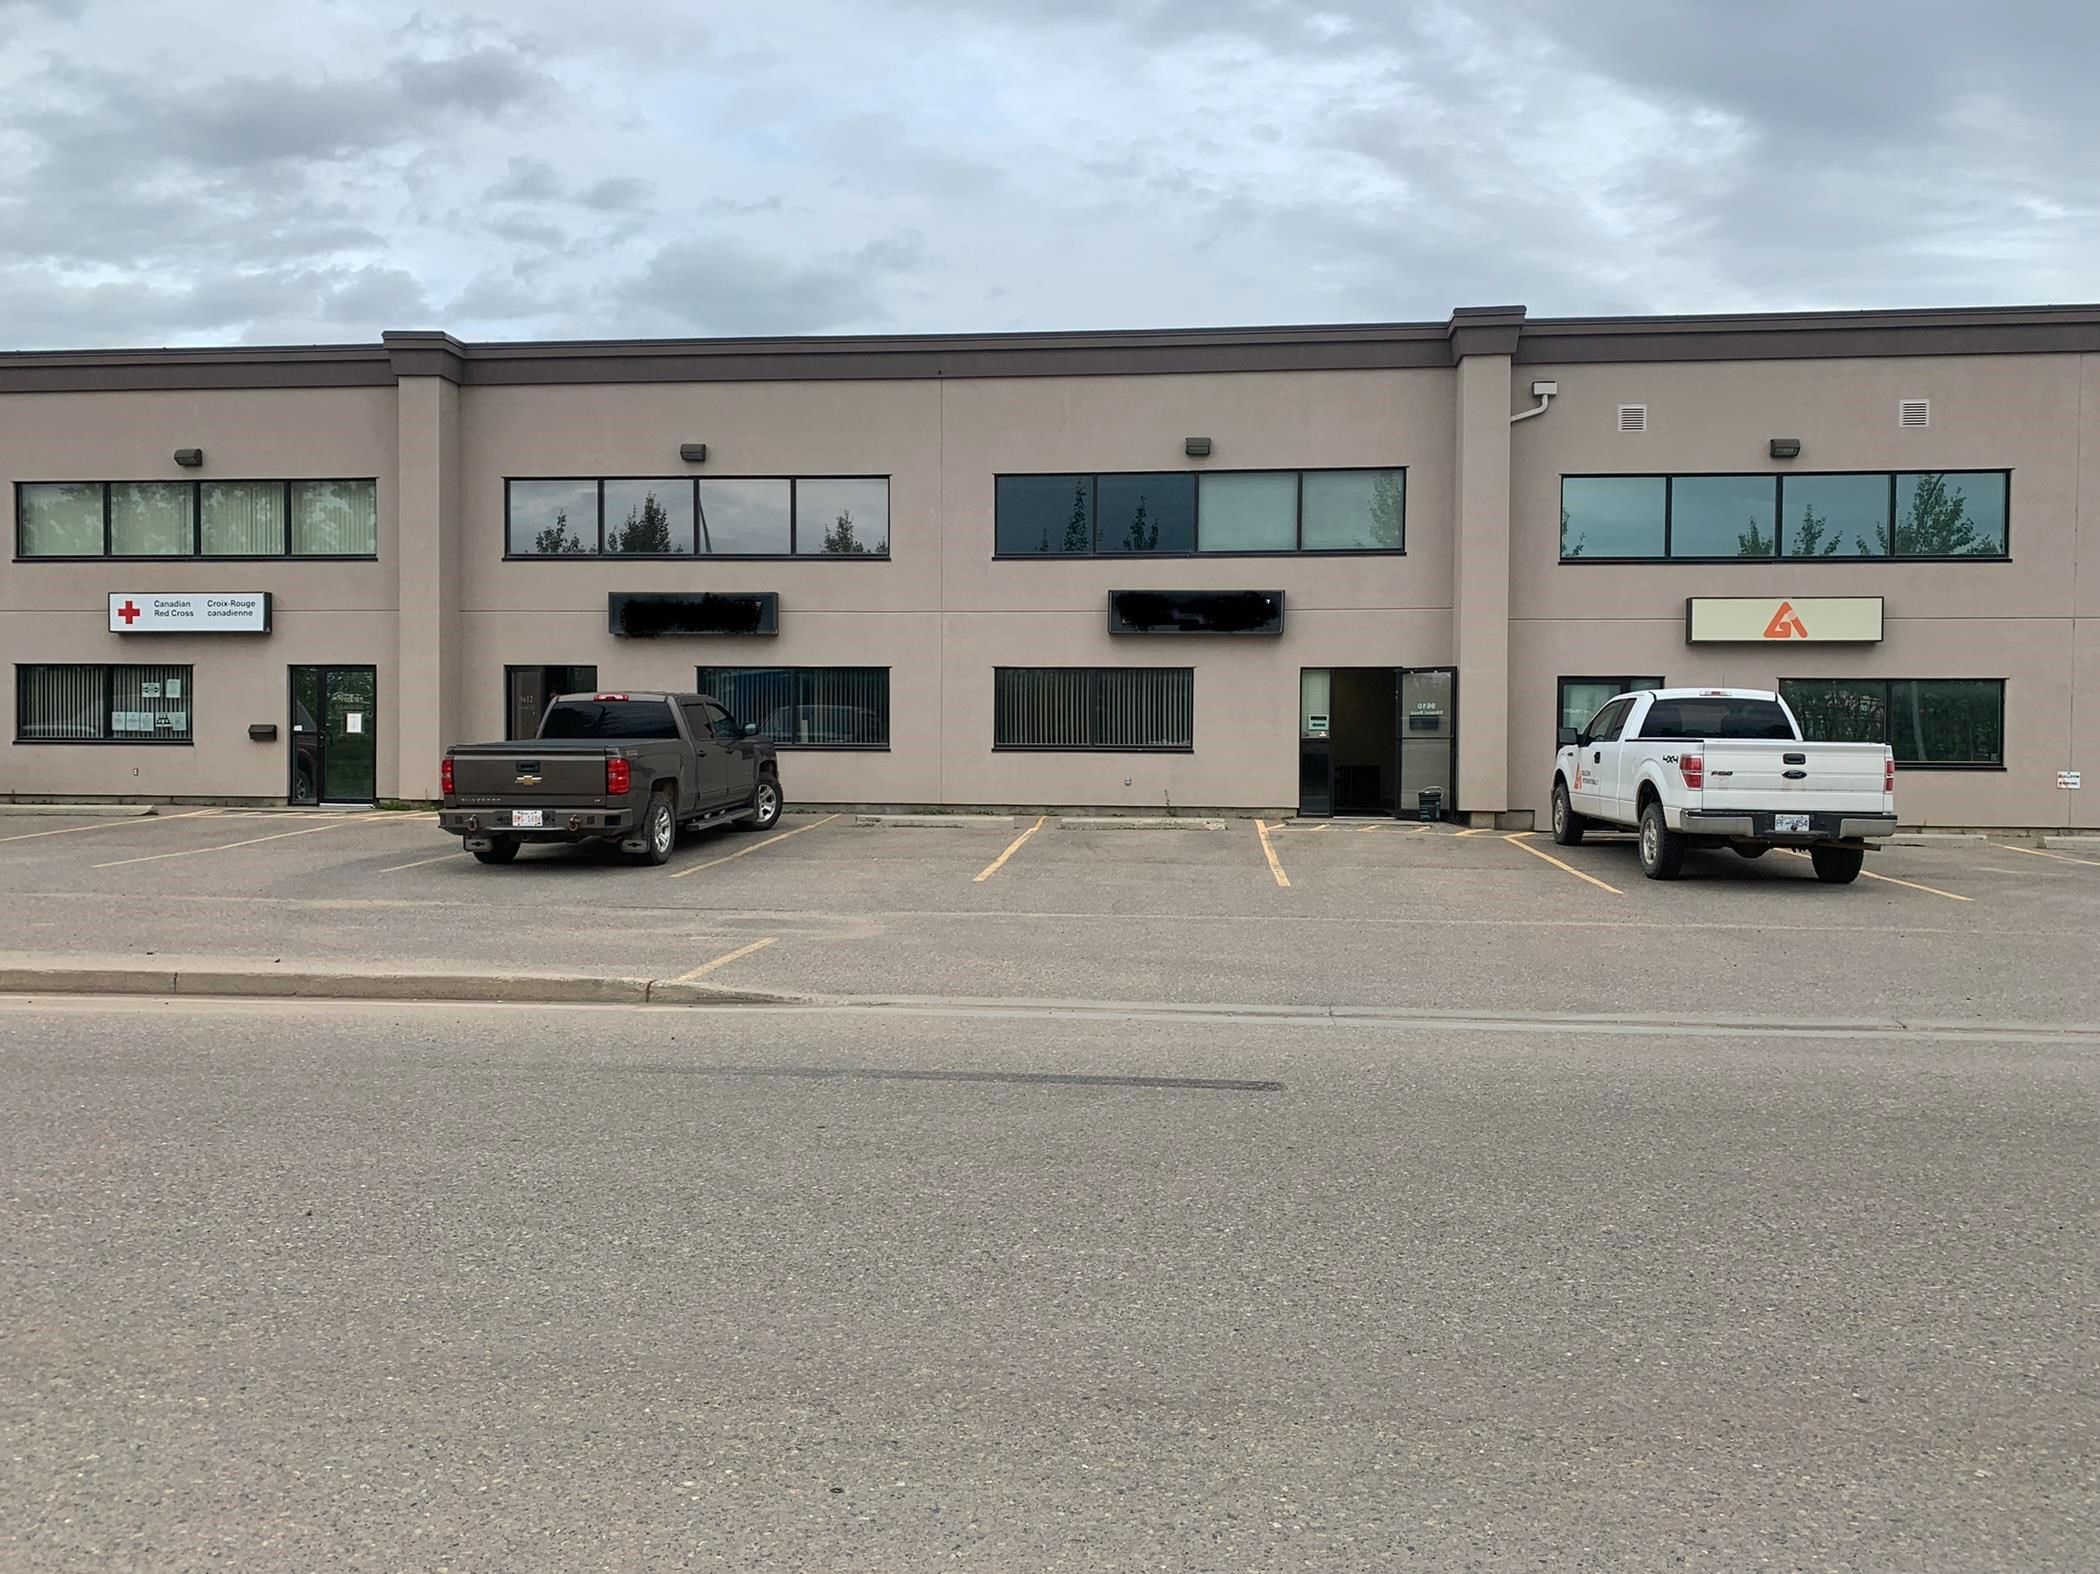 Main Photo: 9610 SIKANNI Road in Fort St. John: Fort St. John - City SE Industrial for lease (Fort St. John (Zone 60))  : MLS®# C8040159